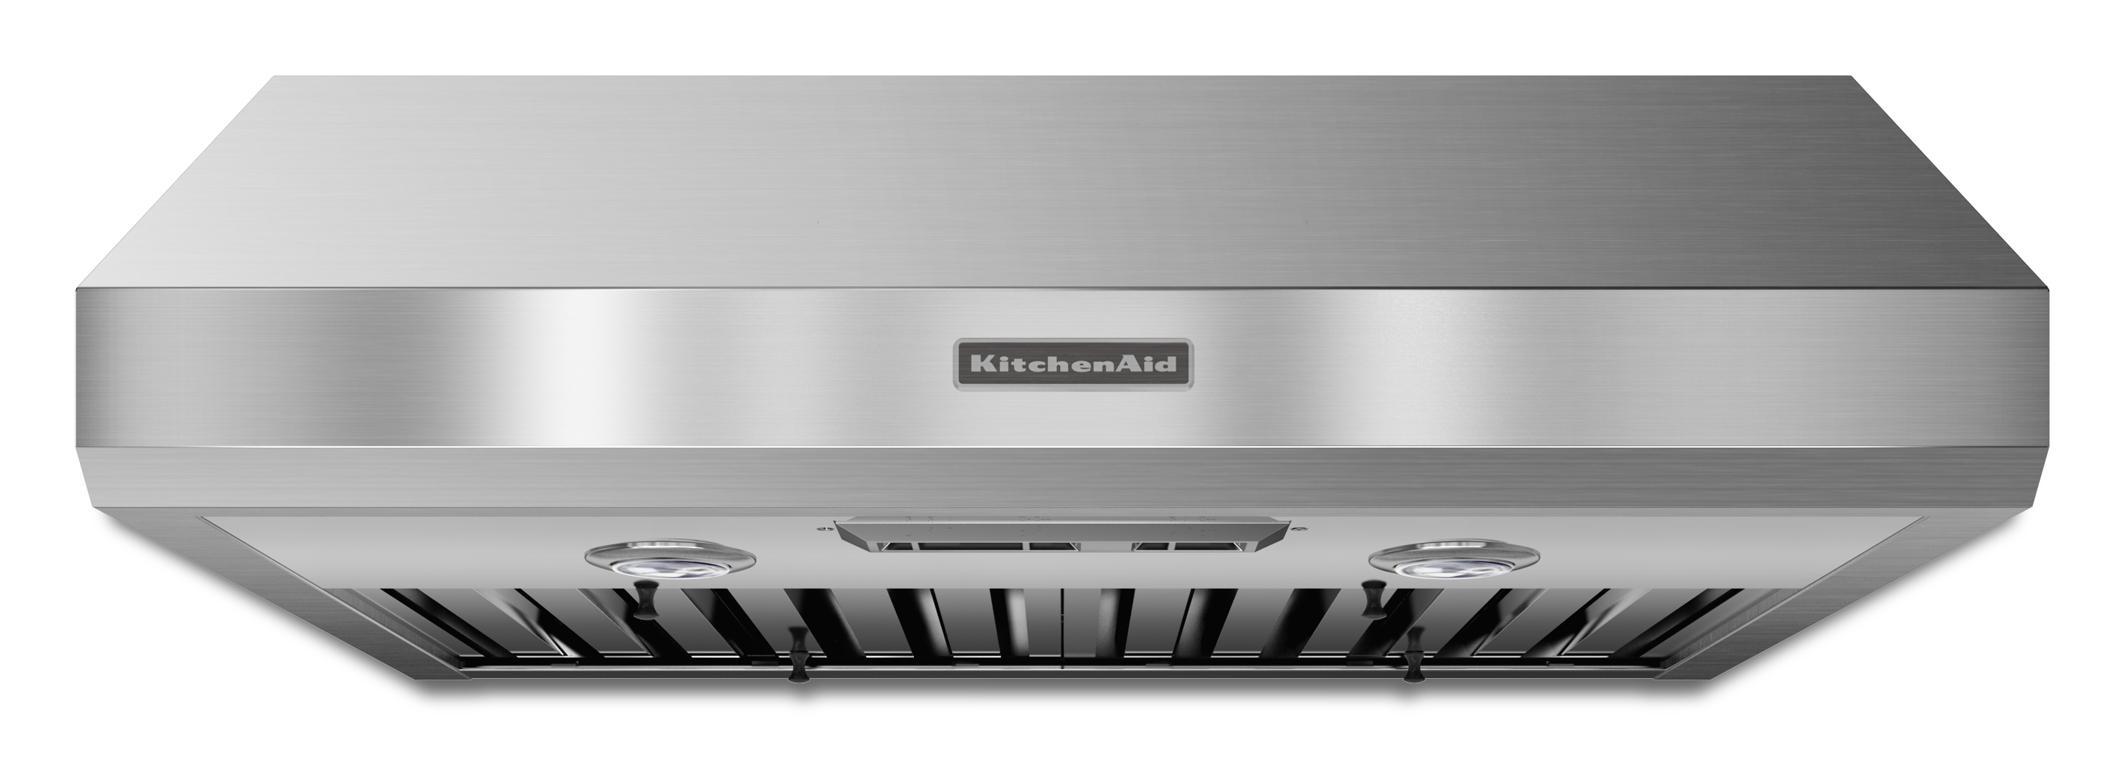 "KitchenAid Range Hoods 30"" Under-the-Cabinet Range Hood - Item Number: KXU8030YSS"